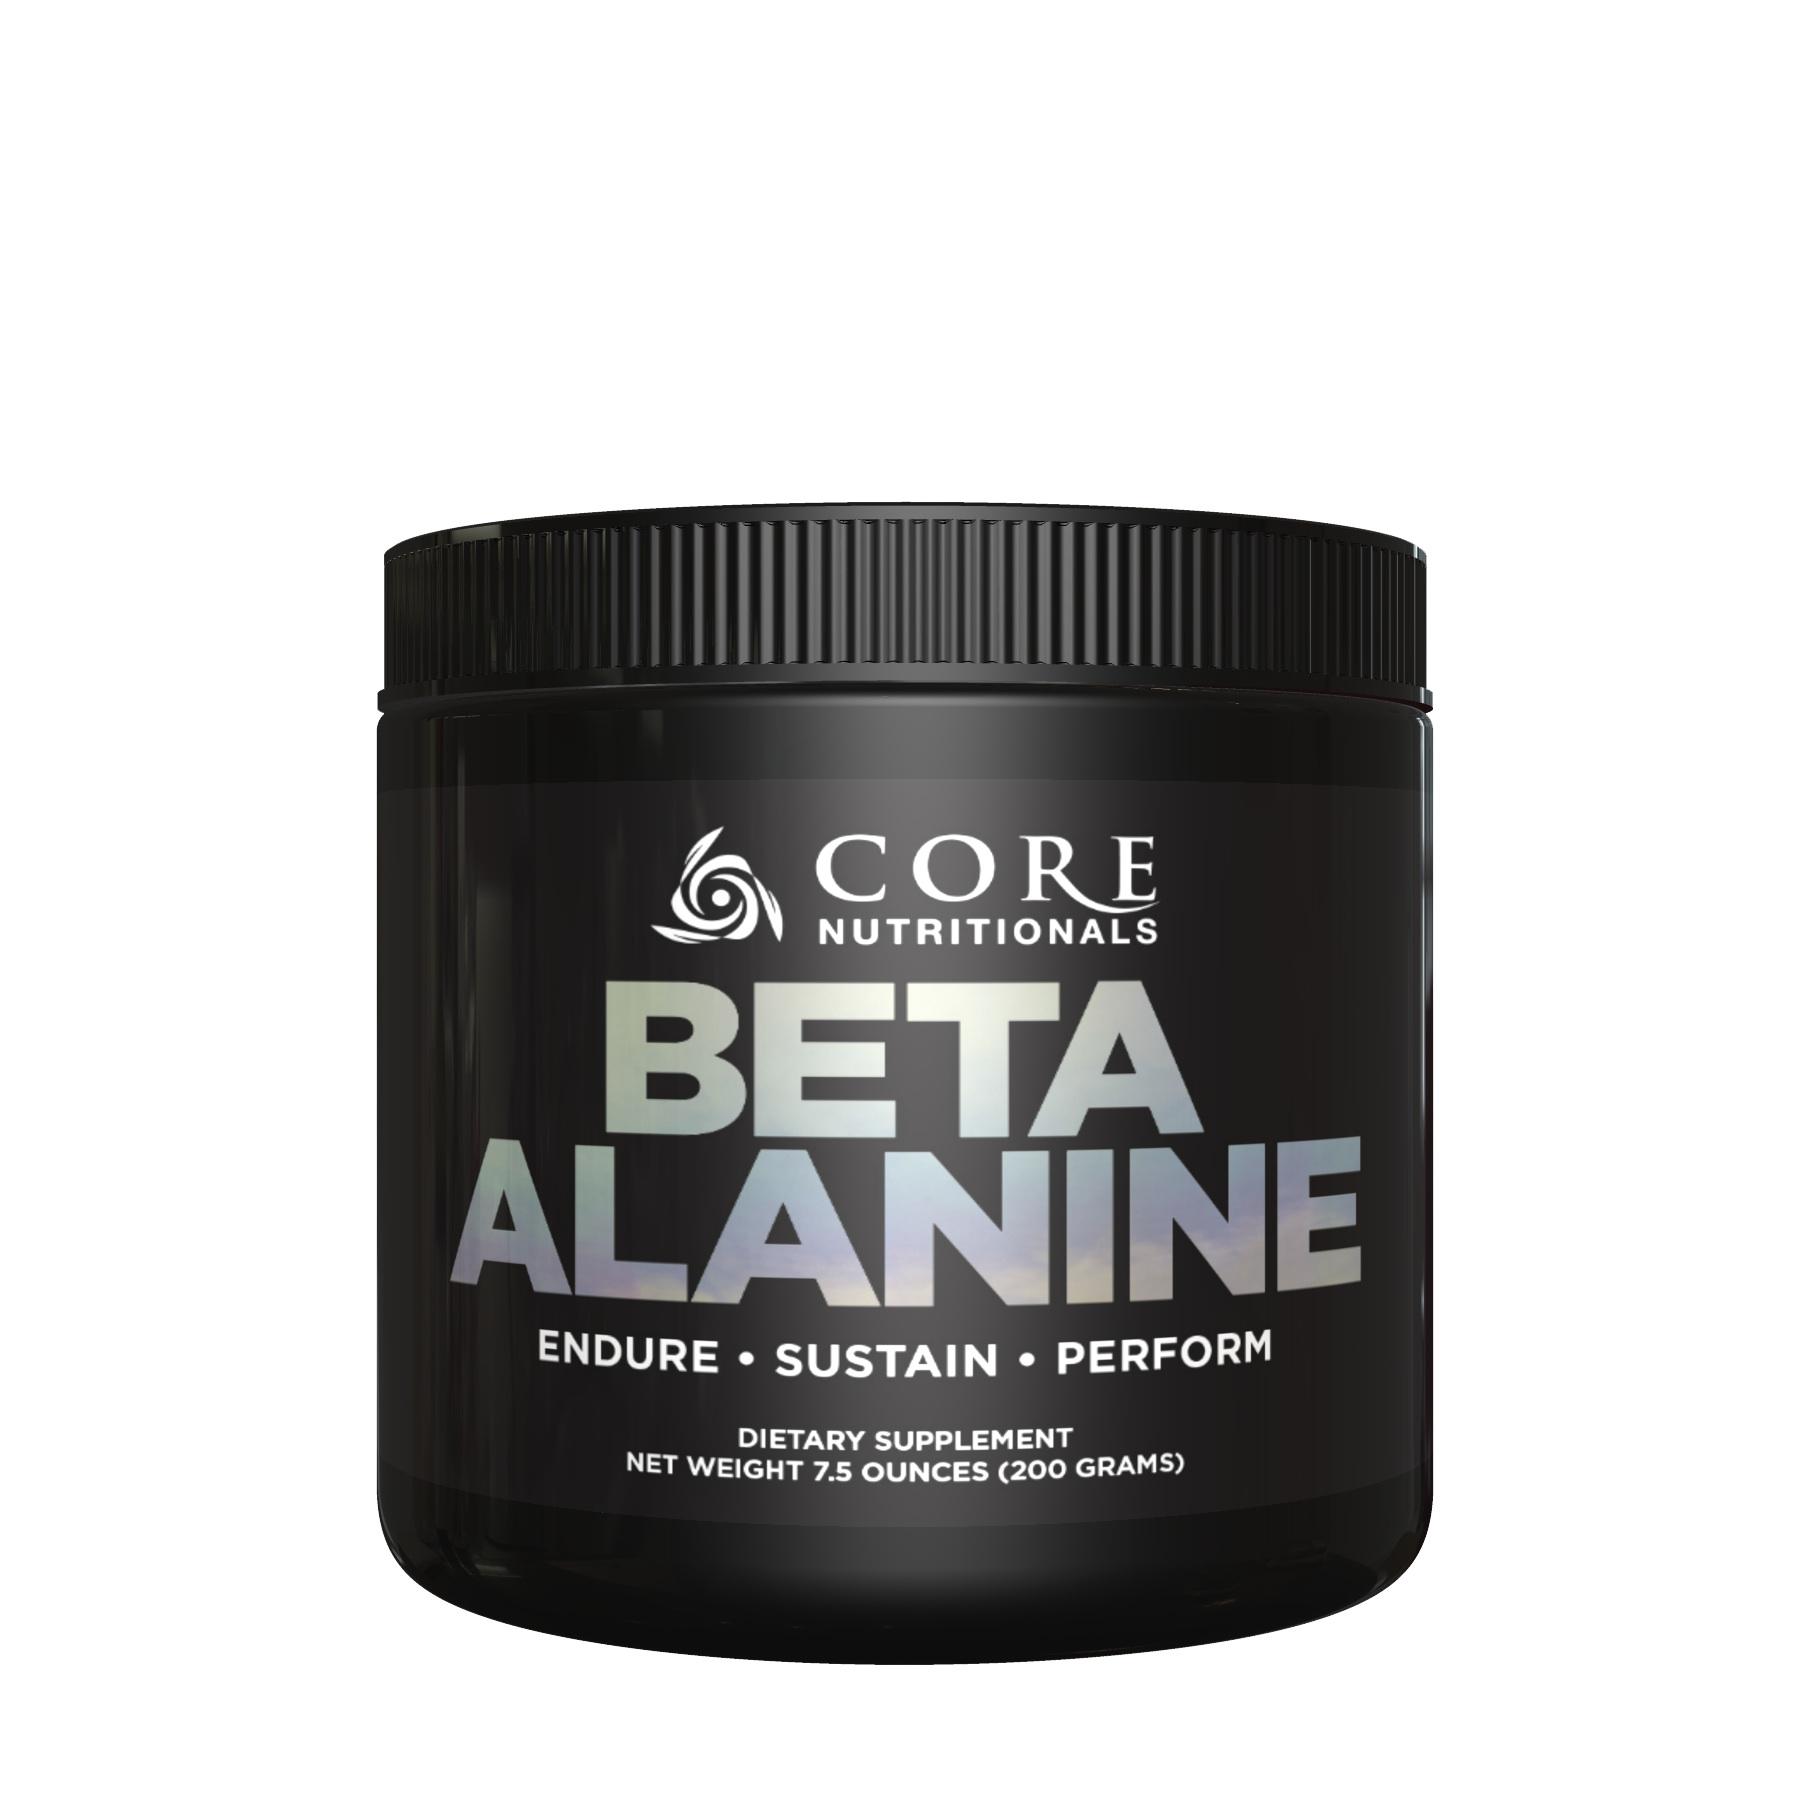 Core Beta Alanine (200 Grams)